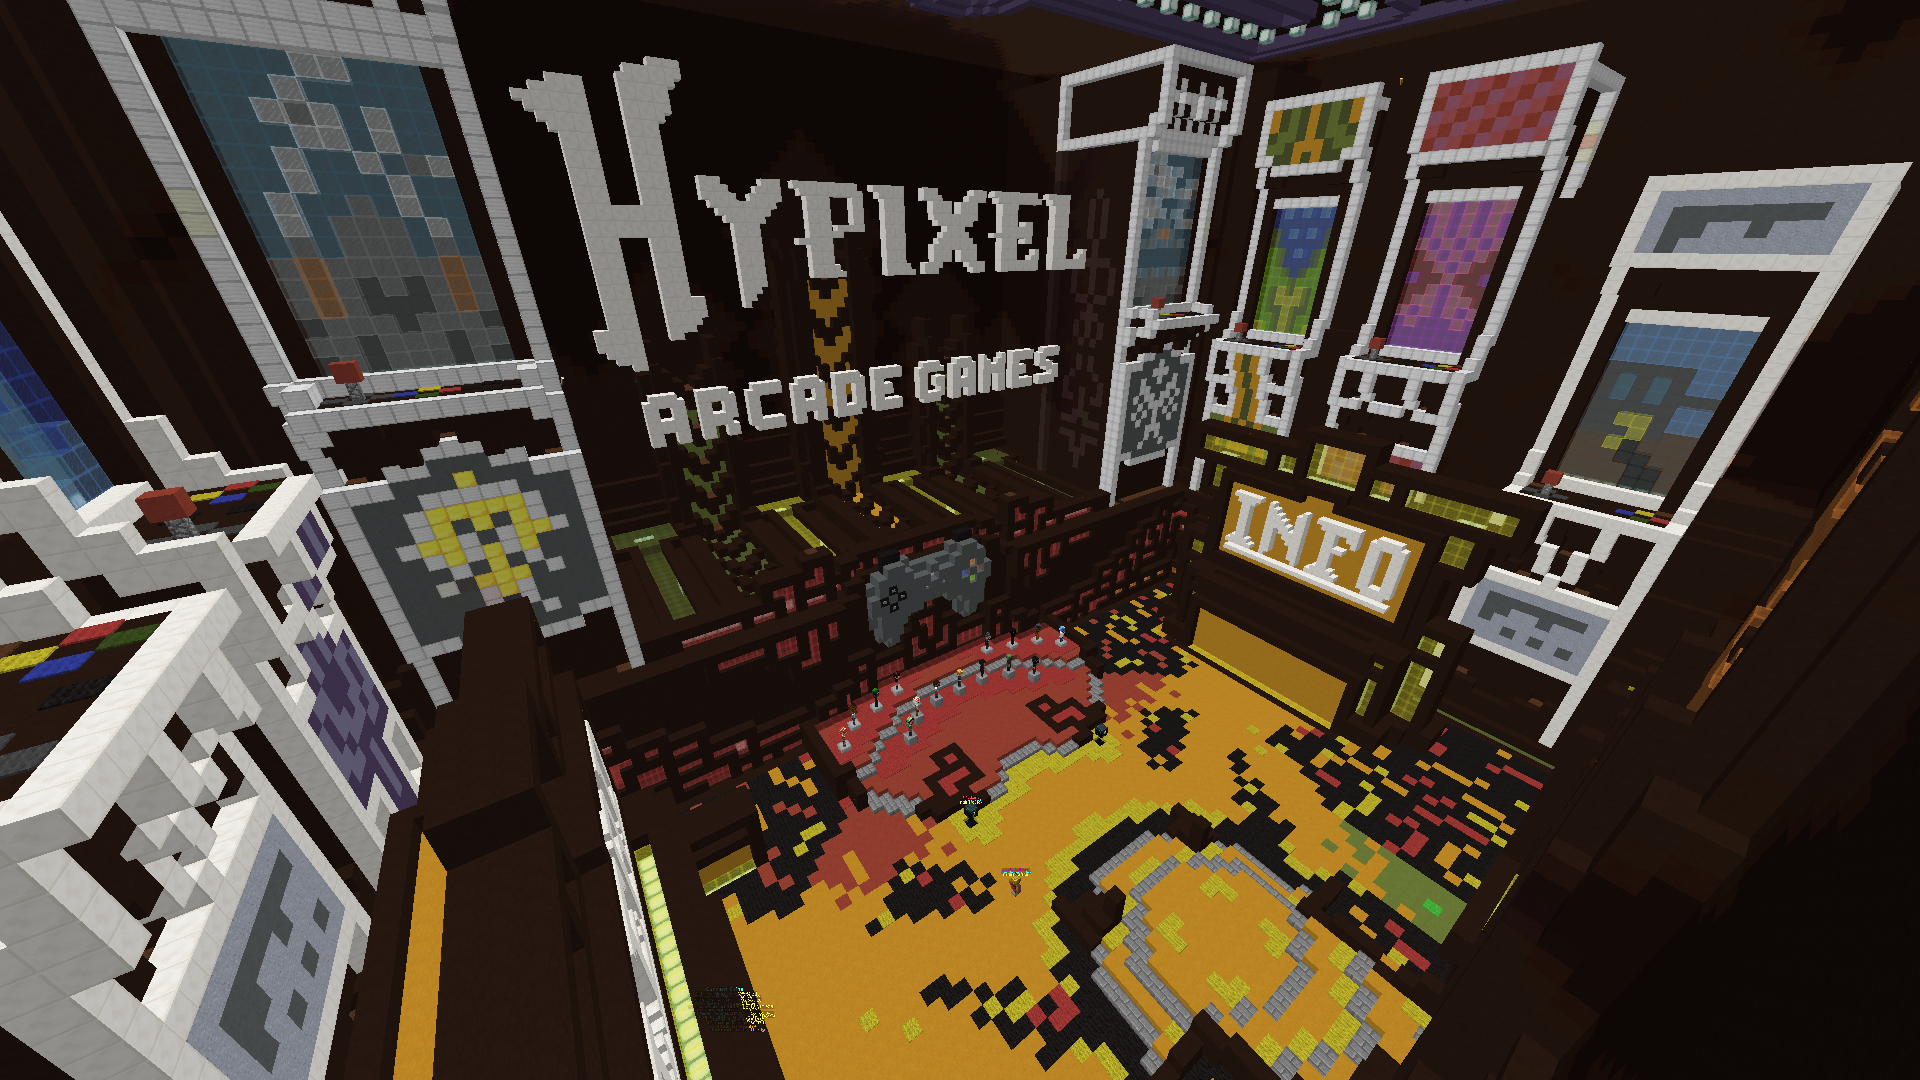 The Arcade Games | Hypixel Wiki | FANDOM powered by Wikia